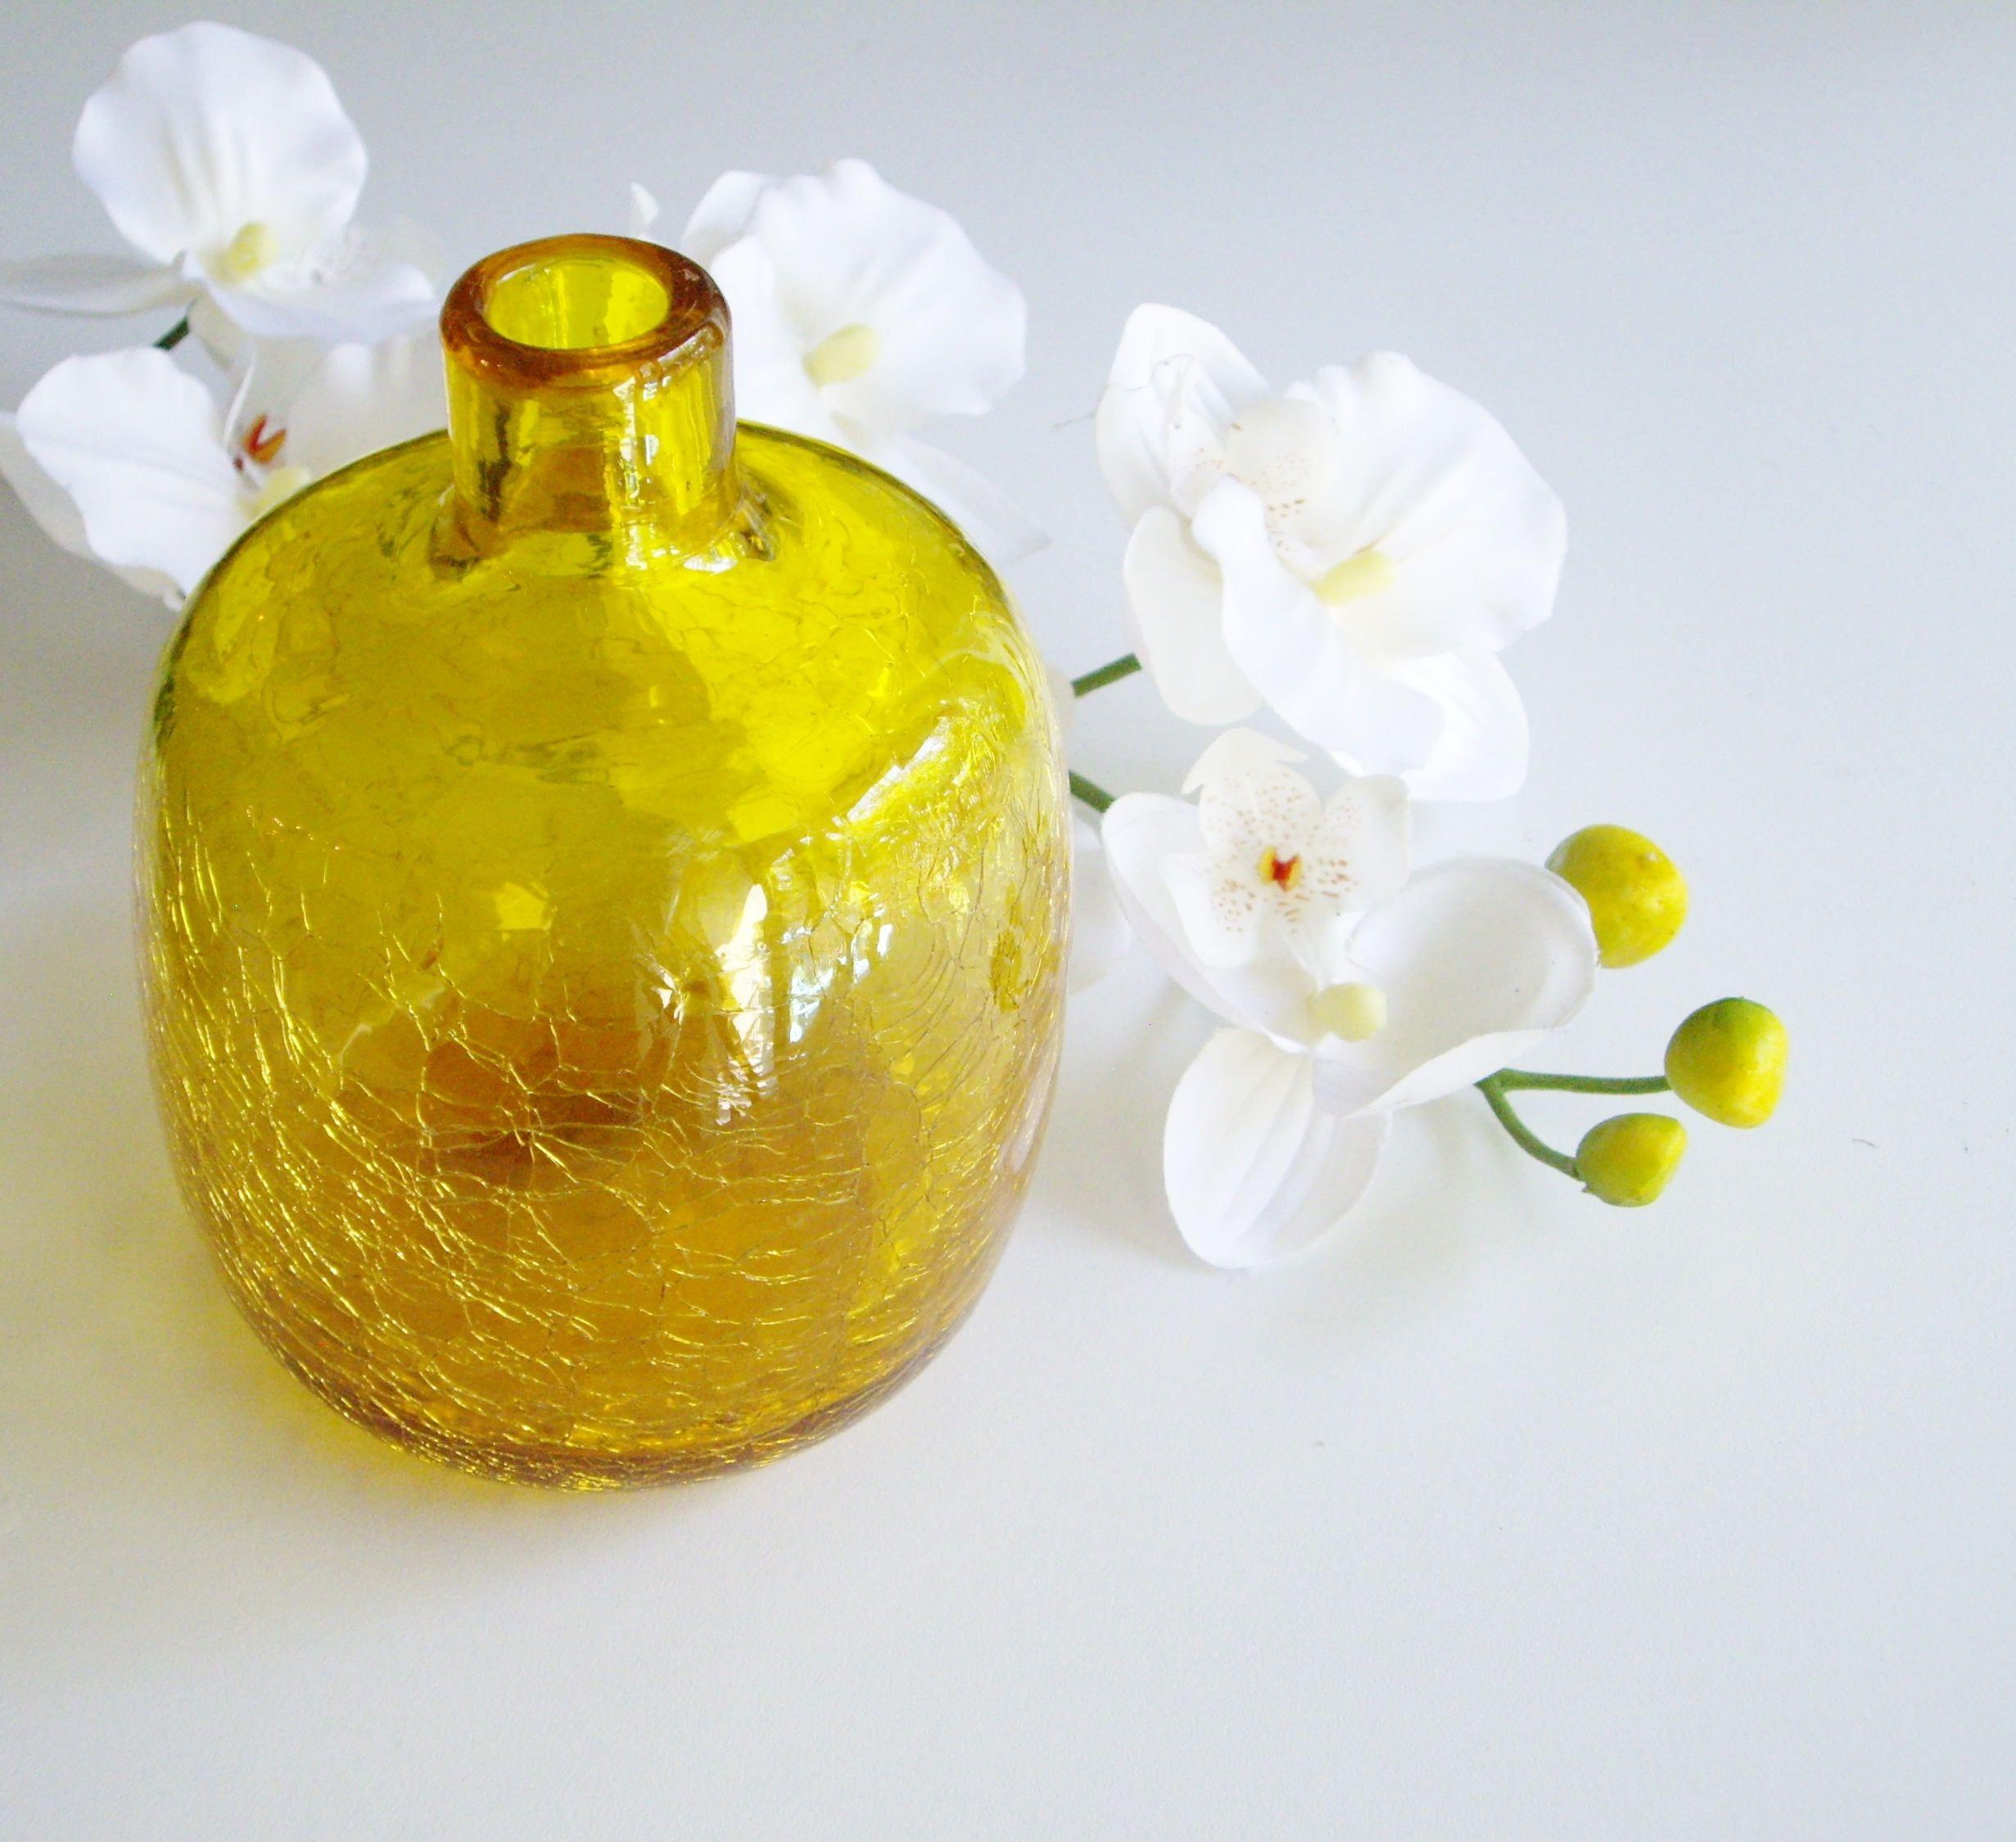 Vintage vase blenko yellow crackle glass joel myers 6424 vintage vase blenko yellow crackle glass joel myers 6424 lemon reviewsmspy